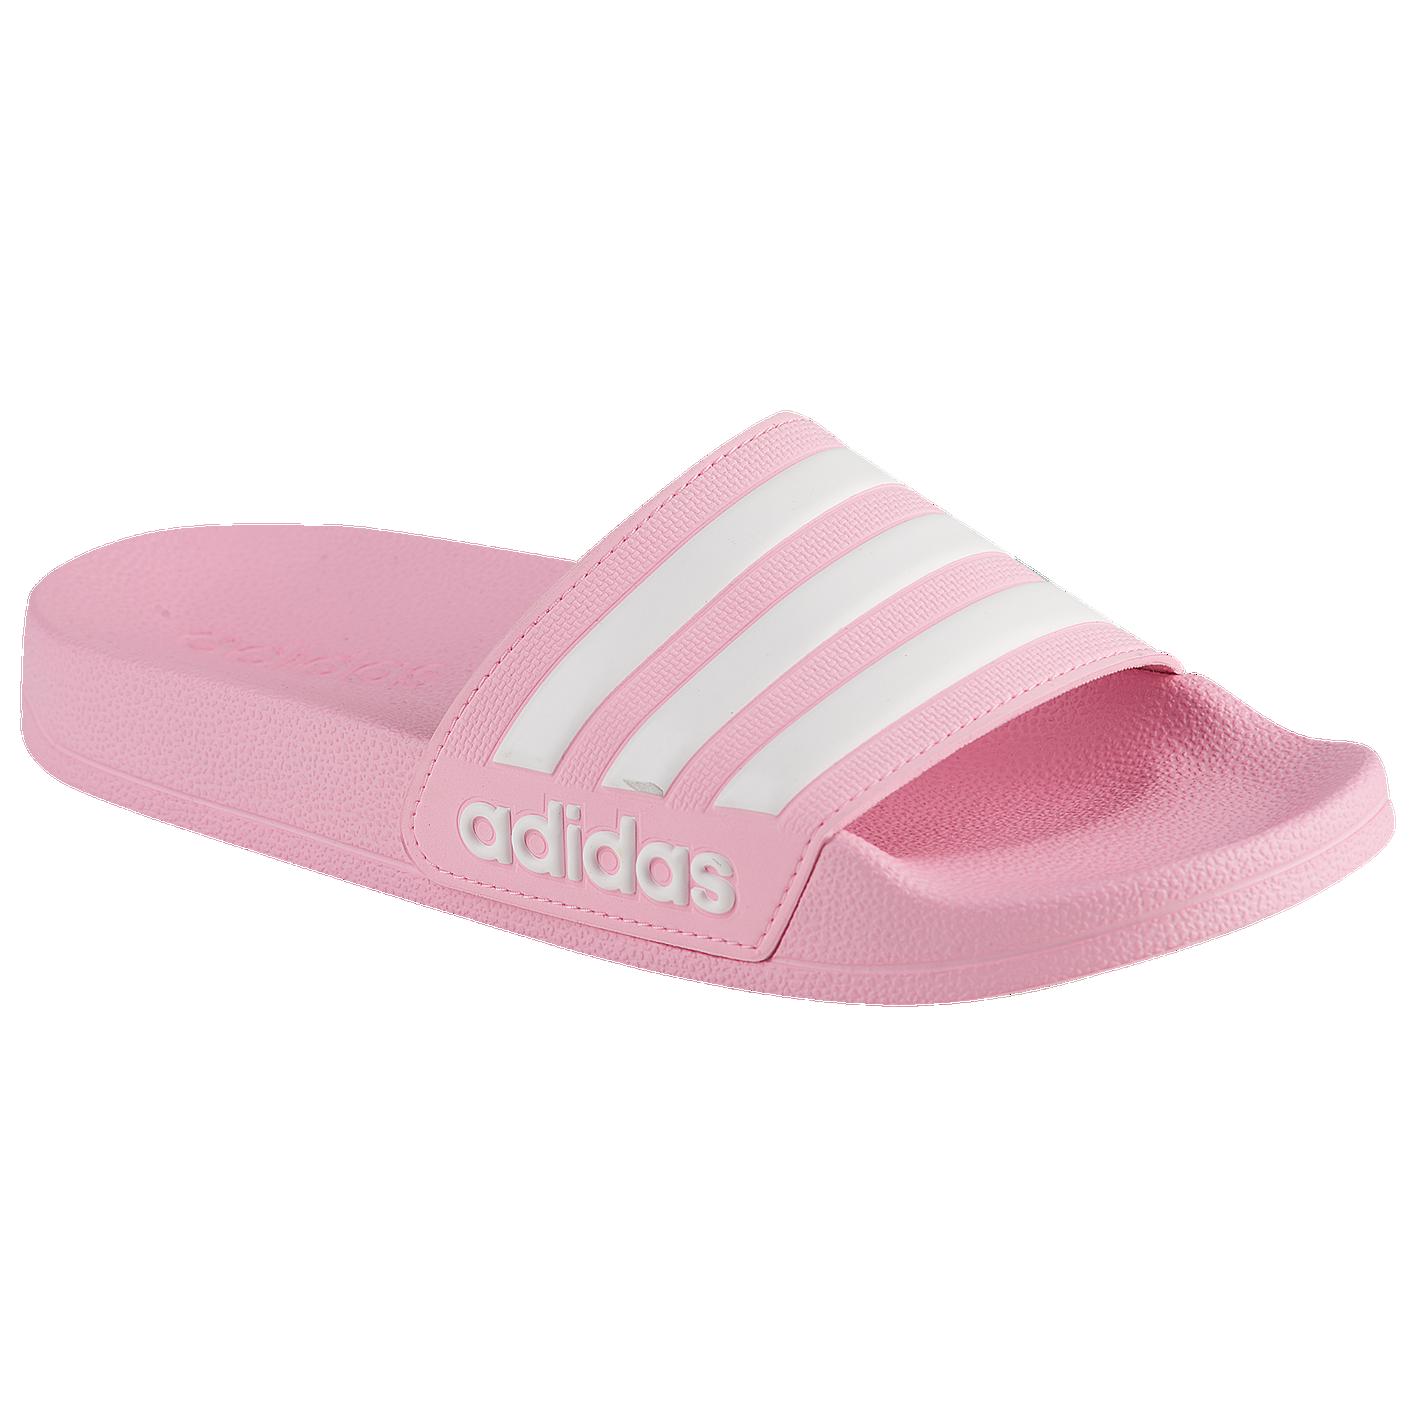 b5e3aed4d adidas Adilette Shower Slide - Girls' Grade School - Casual - Shoes ...